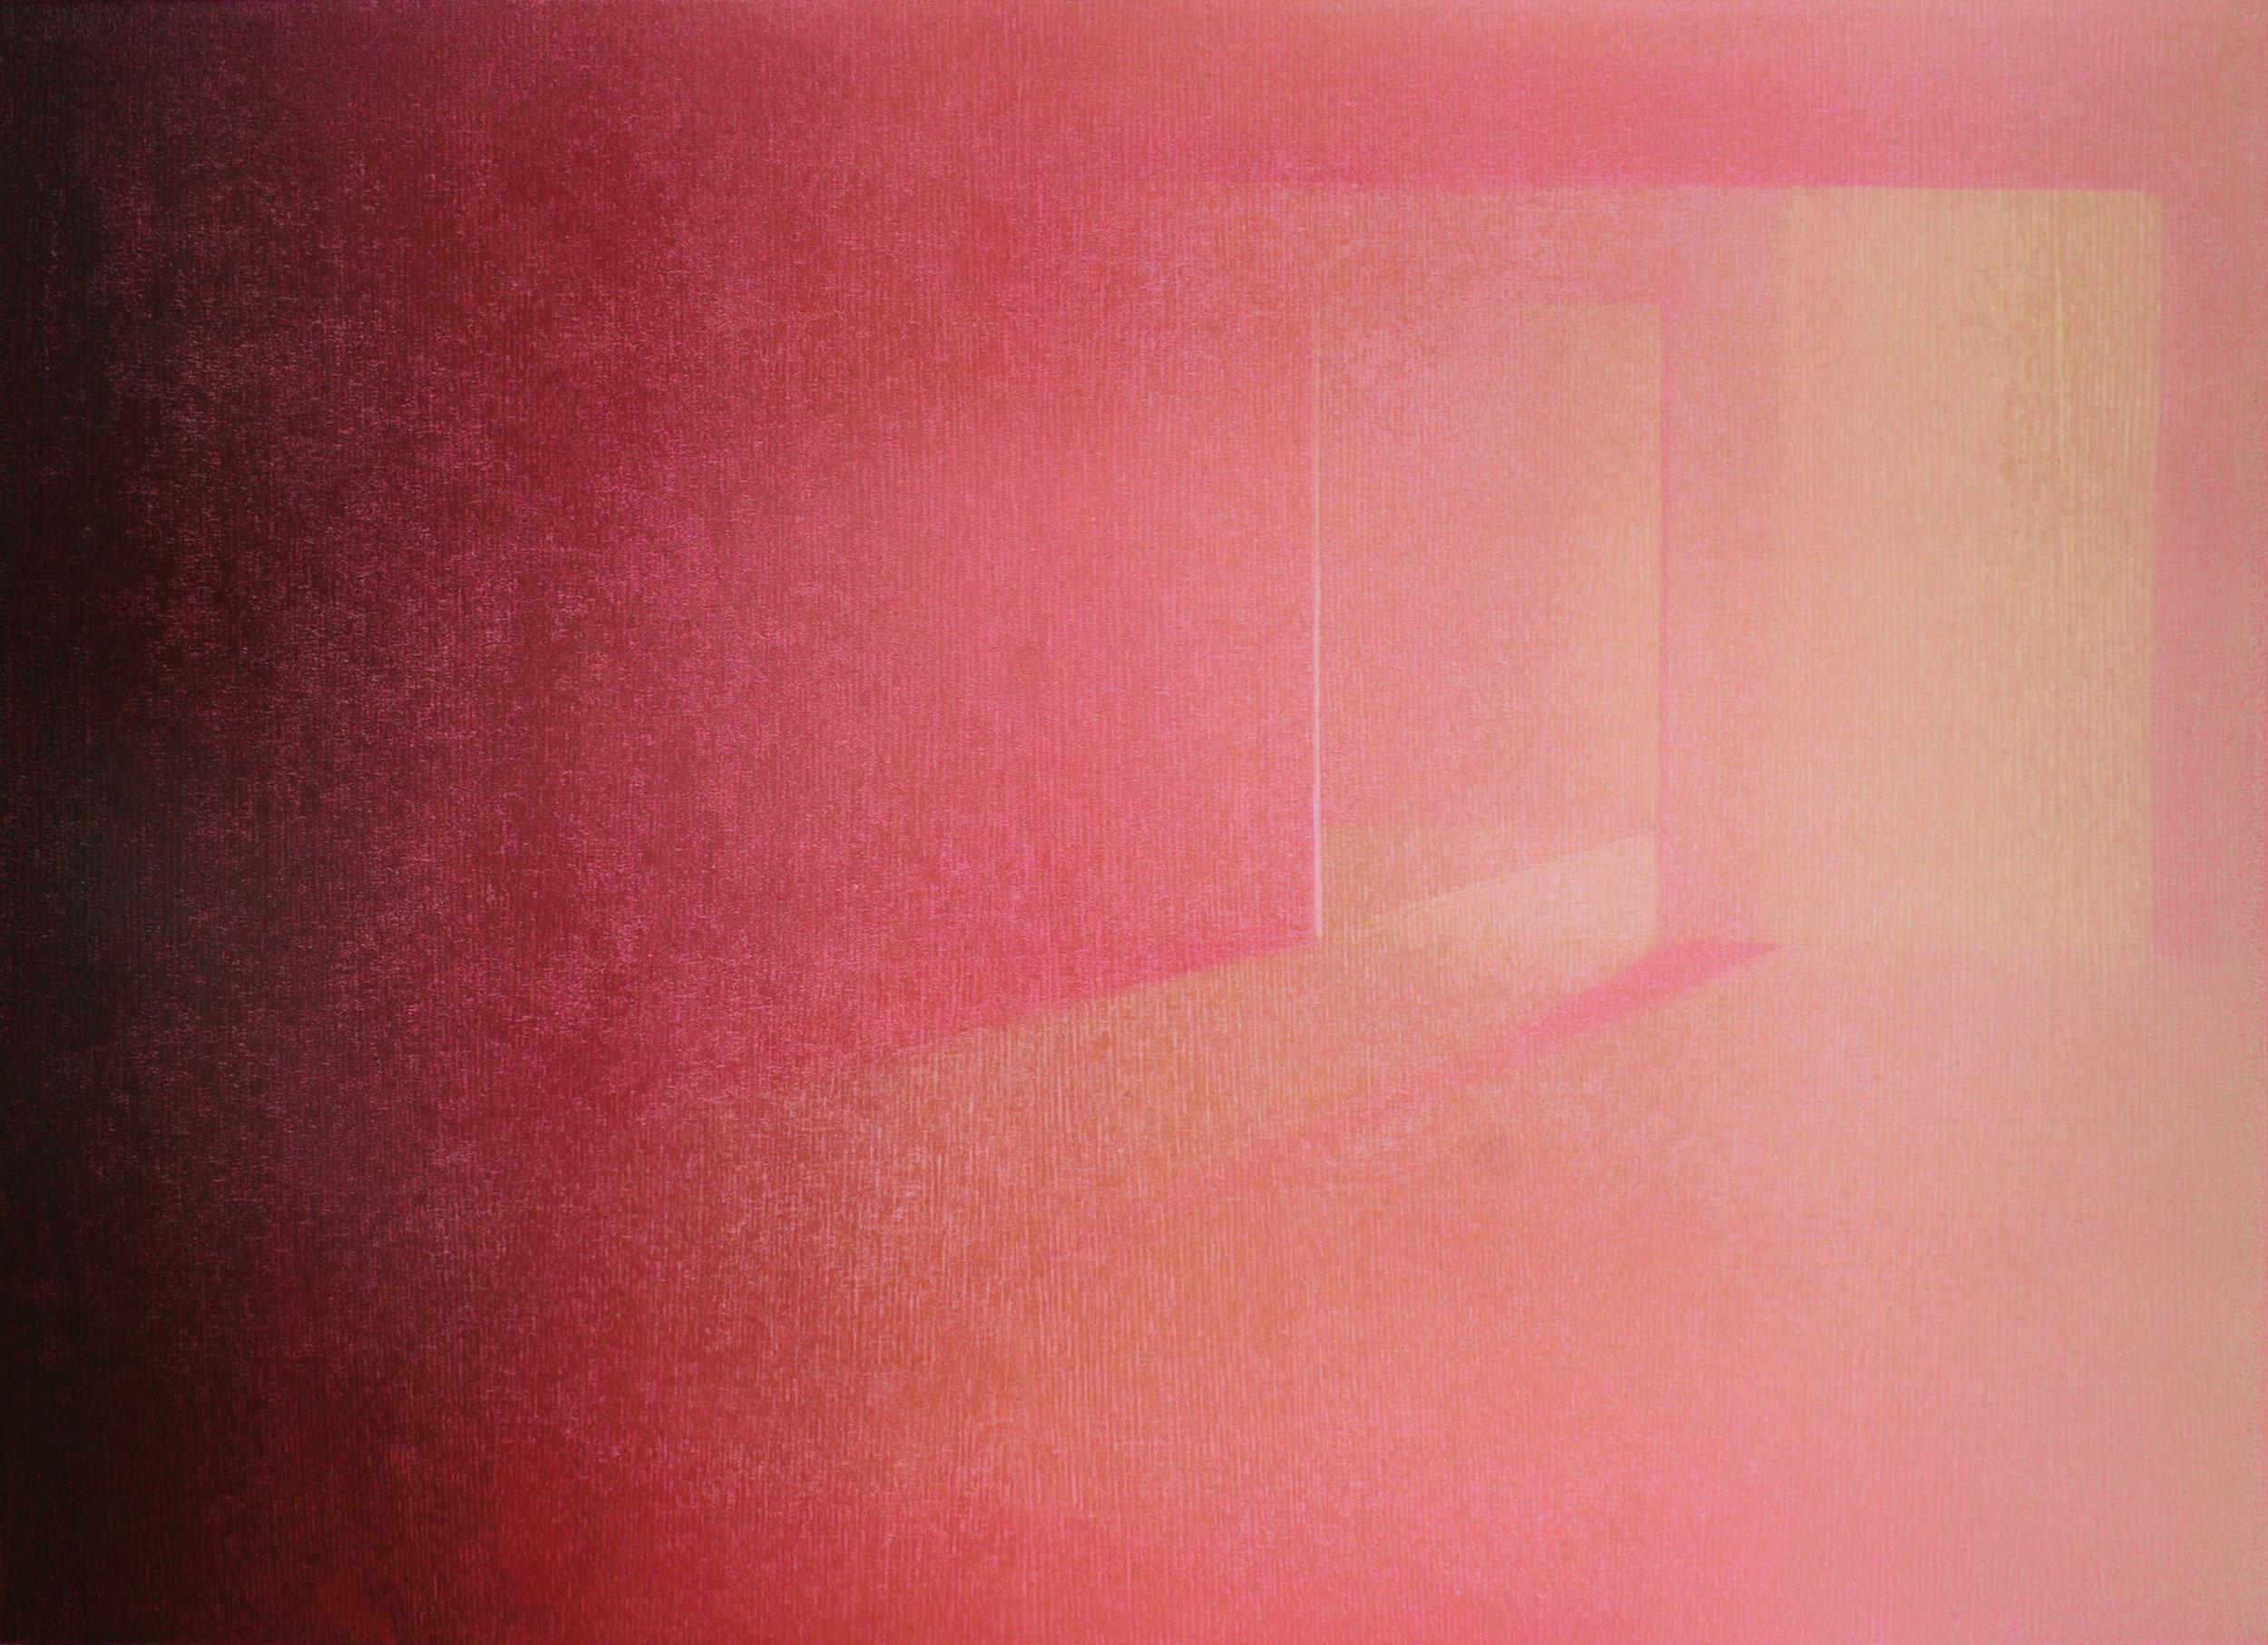 Praween PIANGCHOOMPU, Equilibrium #10, 2019, Woodcut on Paper, 1 of 5, 42 x 60 cm